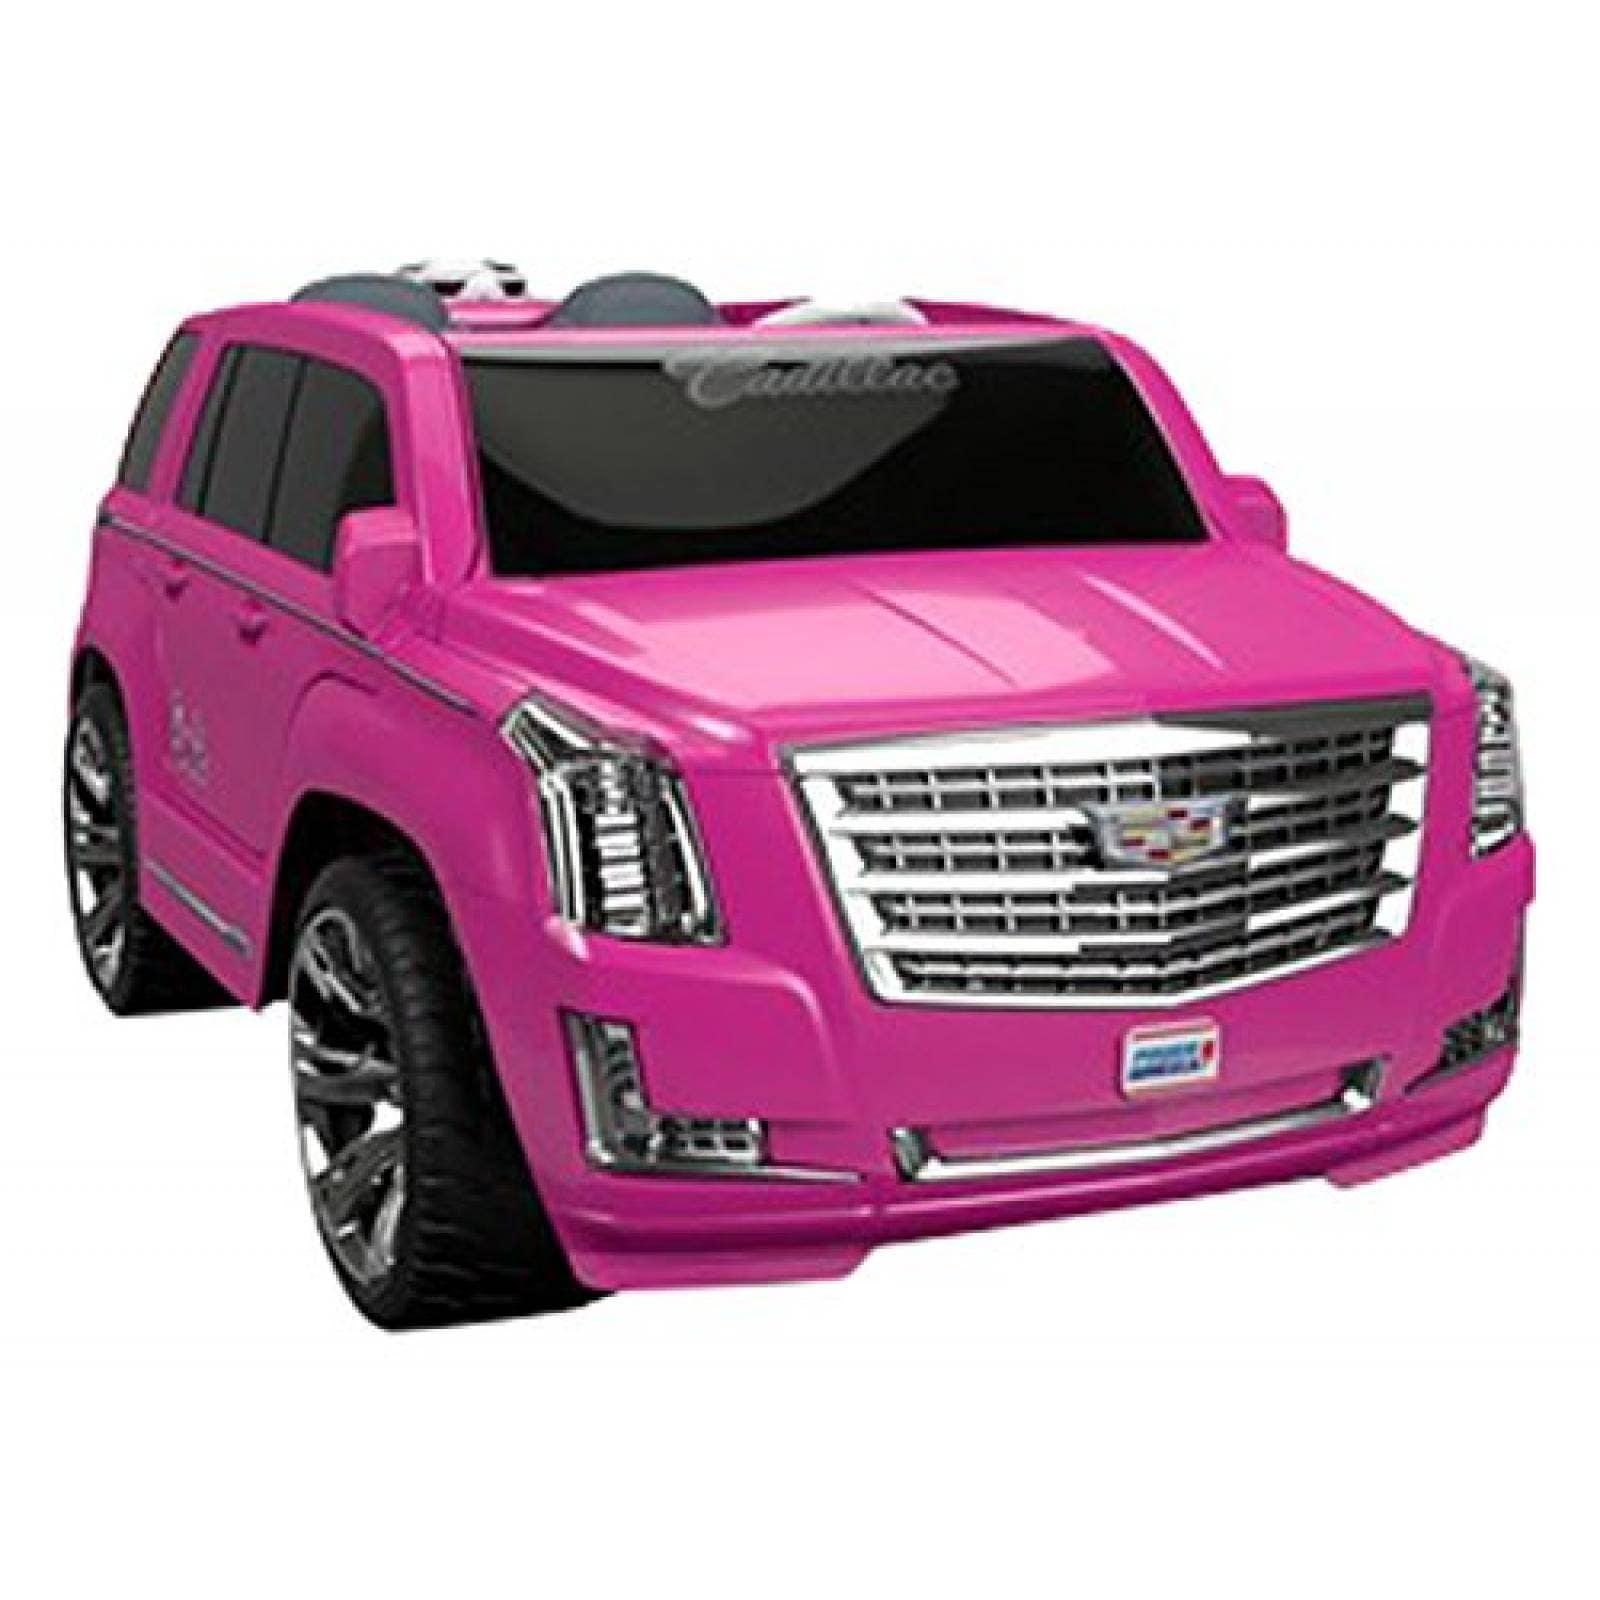 Fisher-Price Power Wheels Vehículo Barbie Escalade